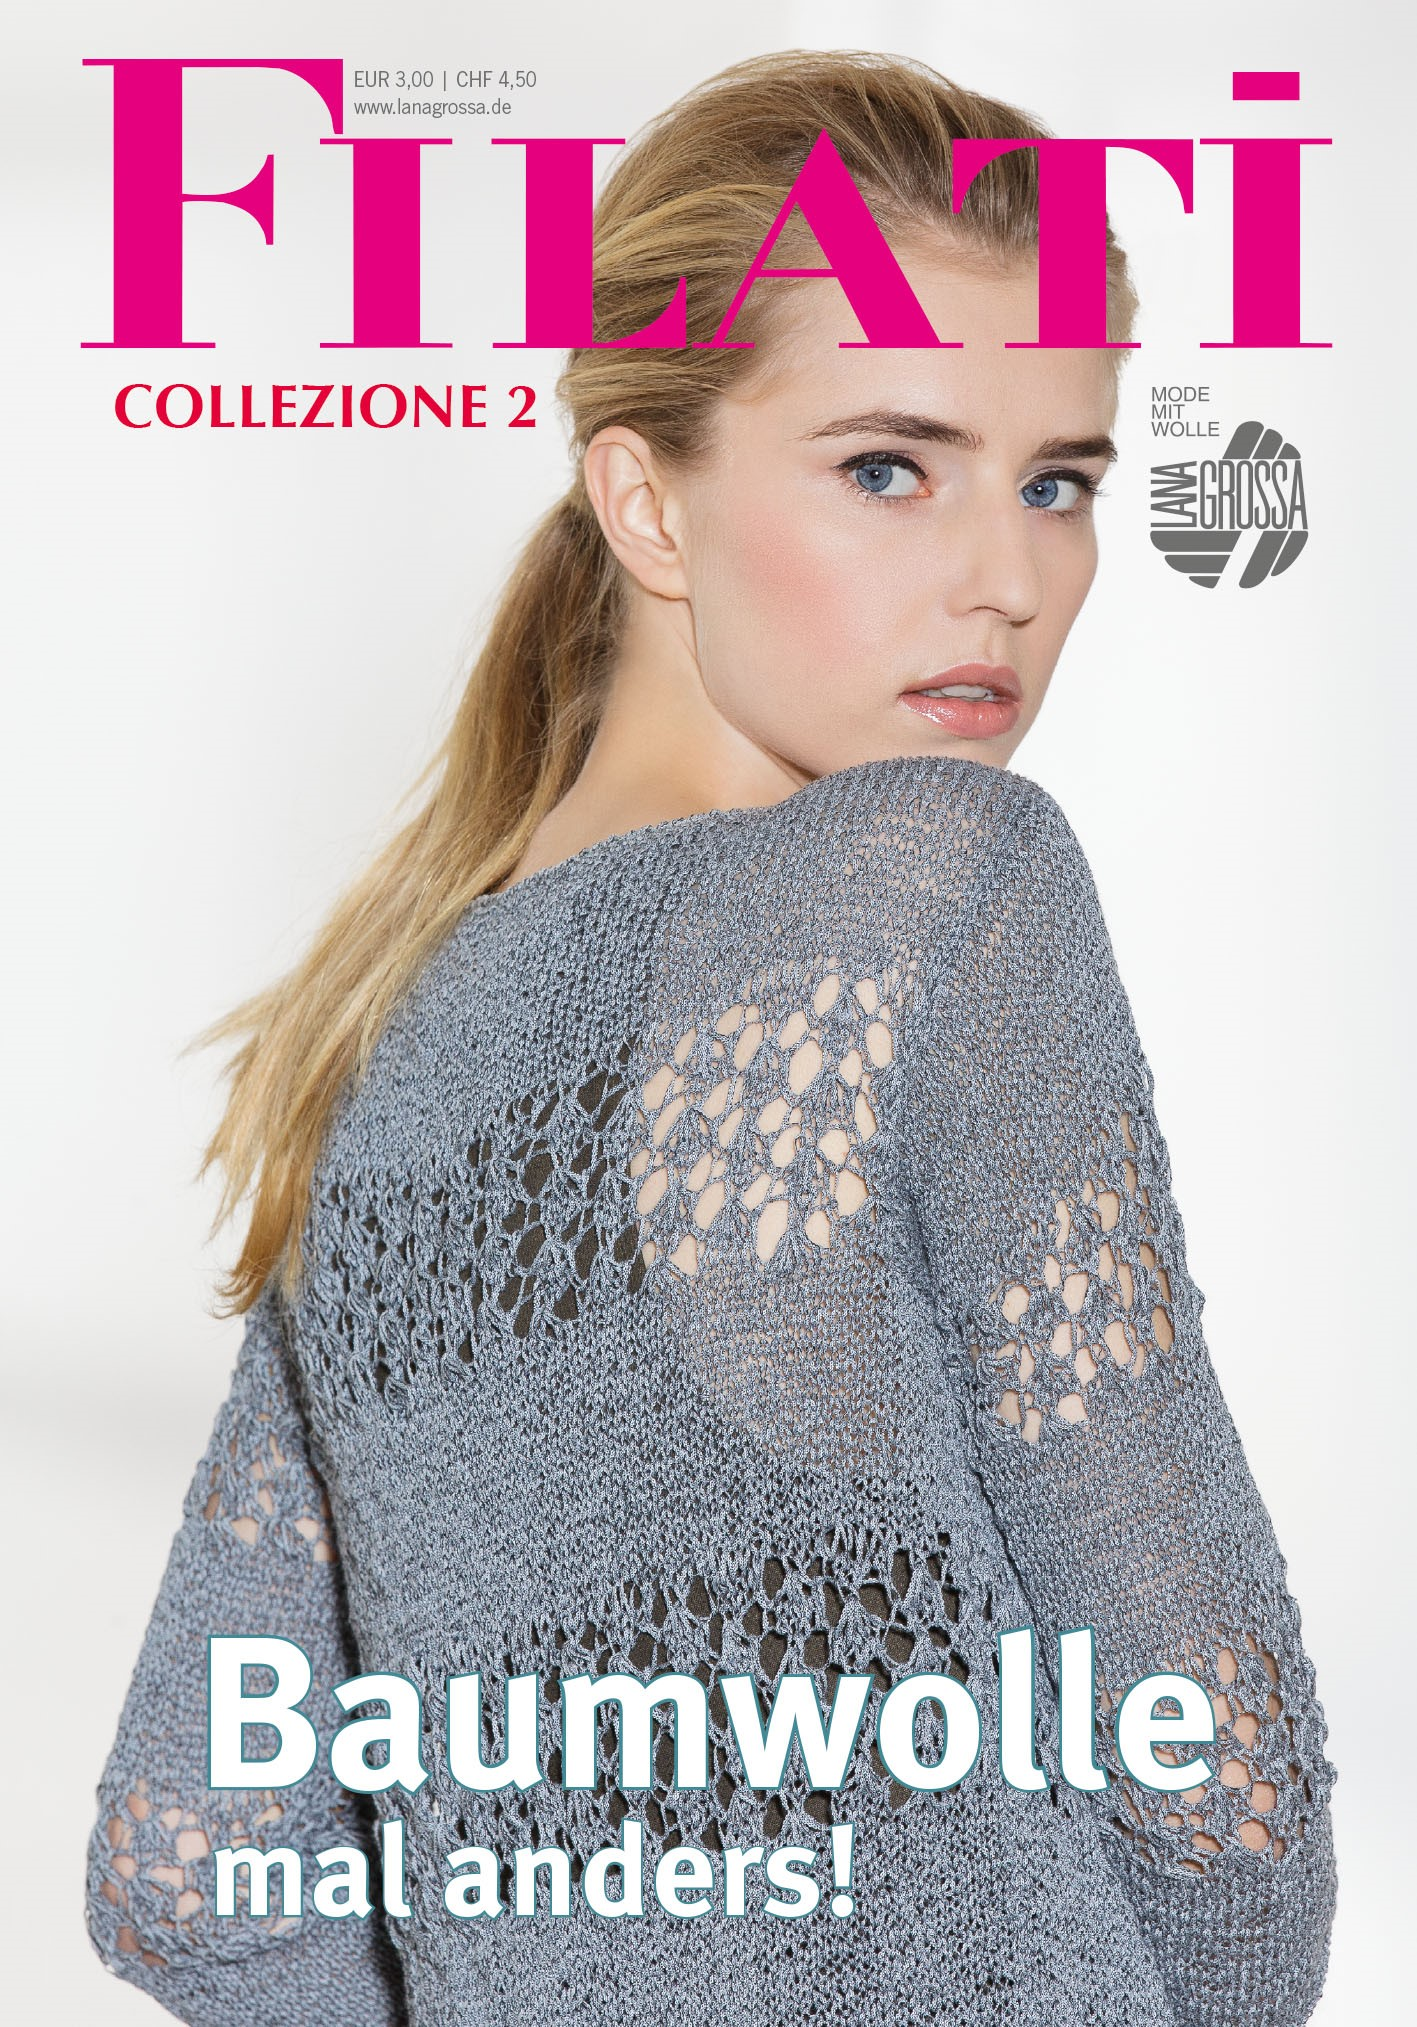 Lana Grossa FILATI COLLEZIONE No. 2 - Журнал на немецком,  инструкции на русском языке